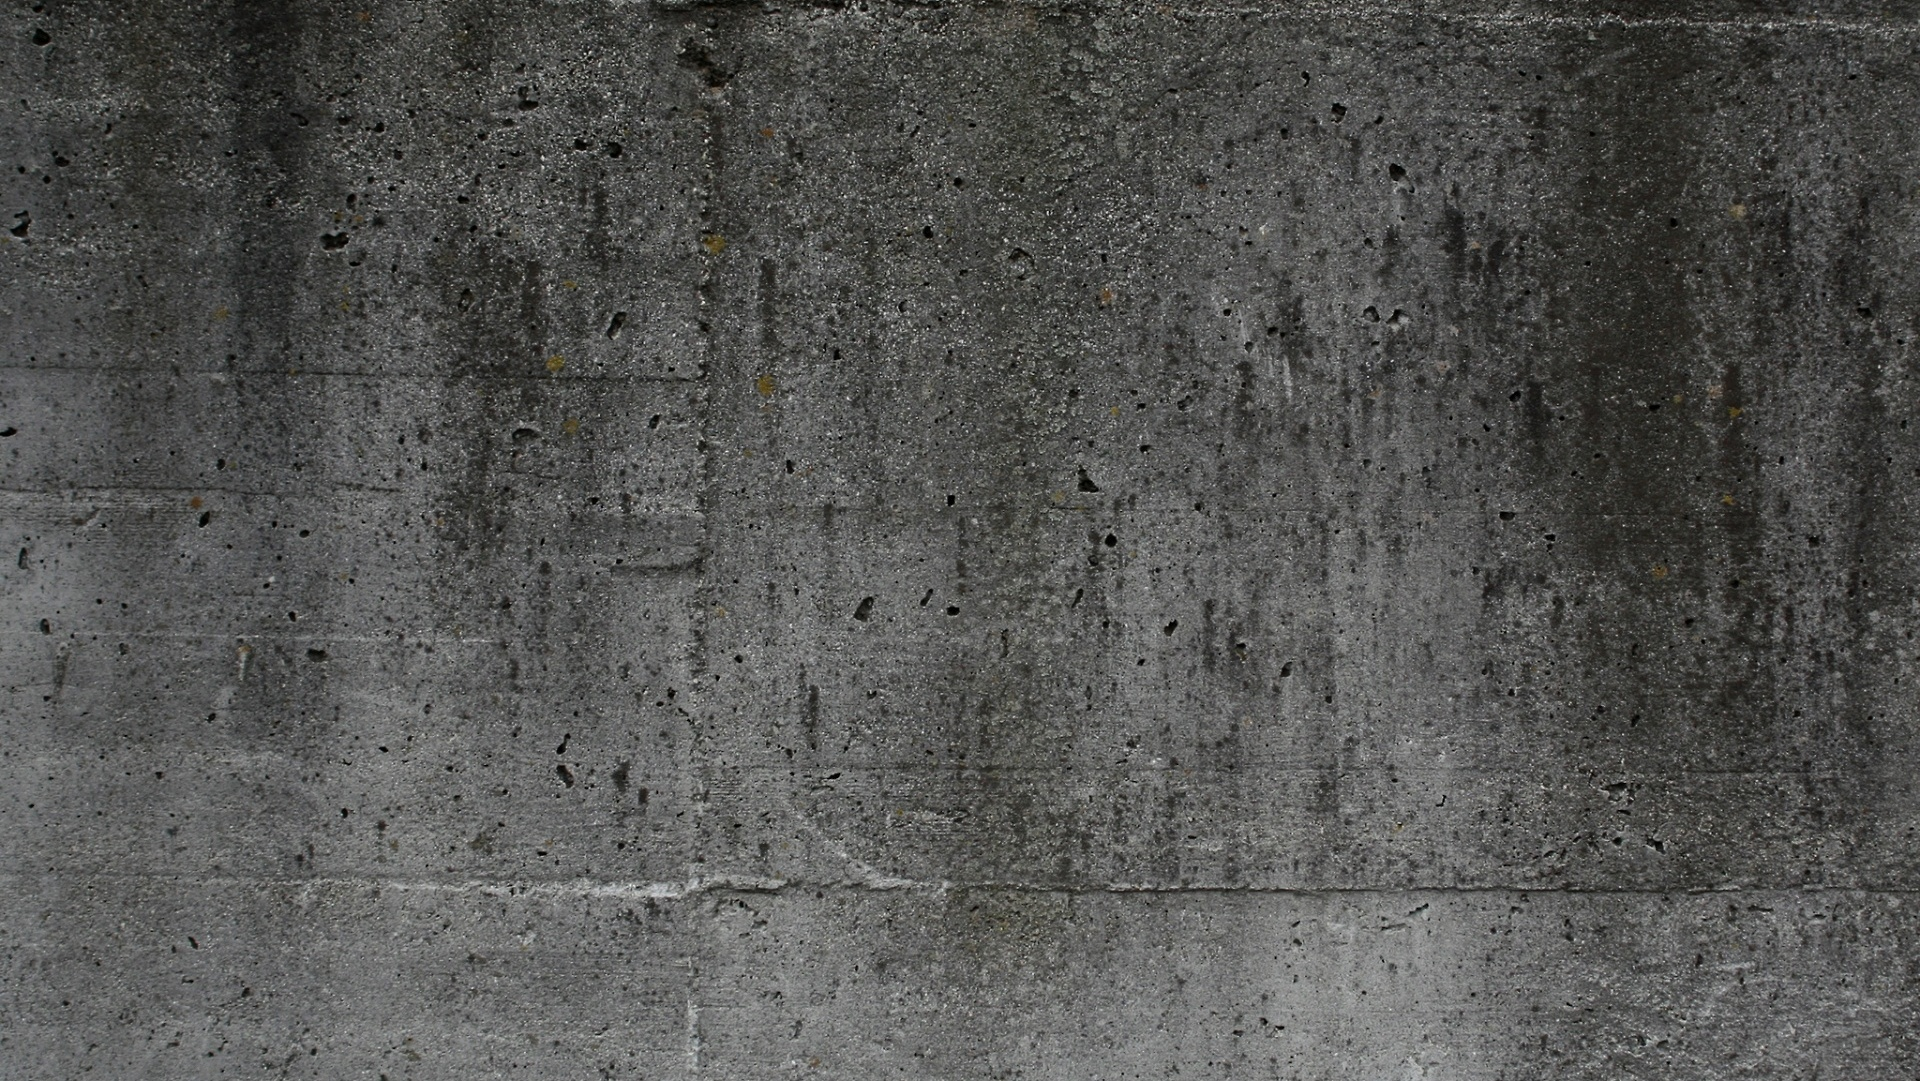 текстура стена штукатурка  № 3915825 бесплатно